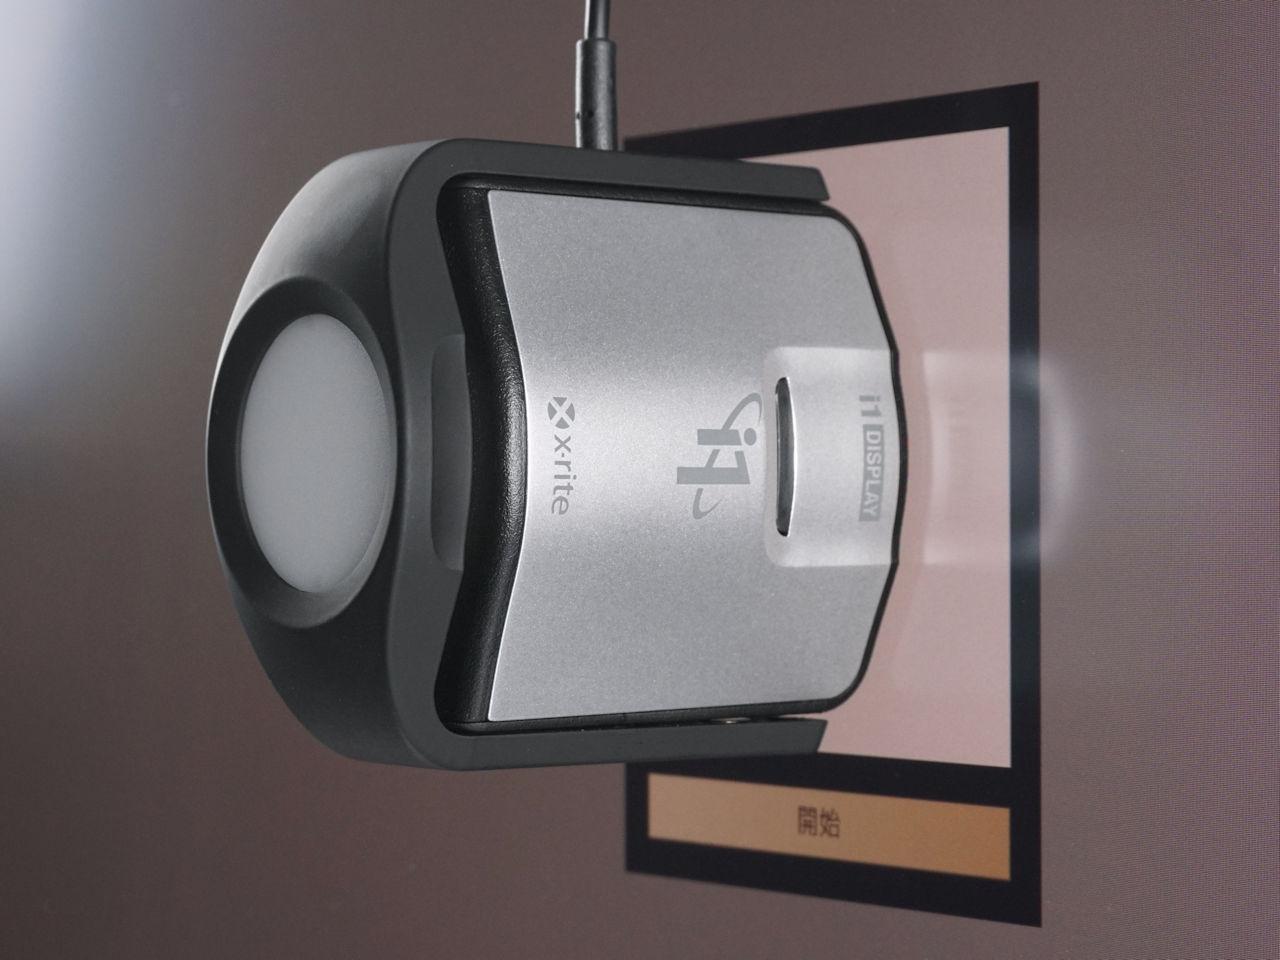 ASUS ProArt Display PA32UCG-K